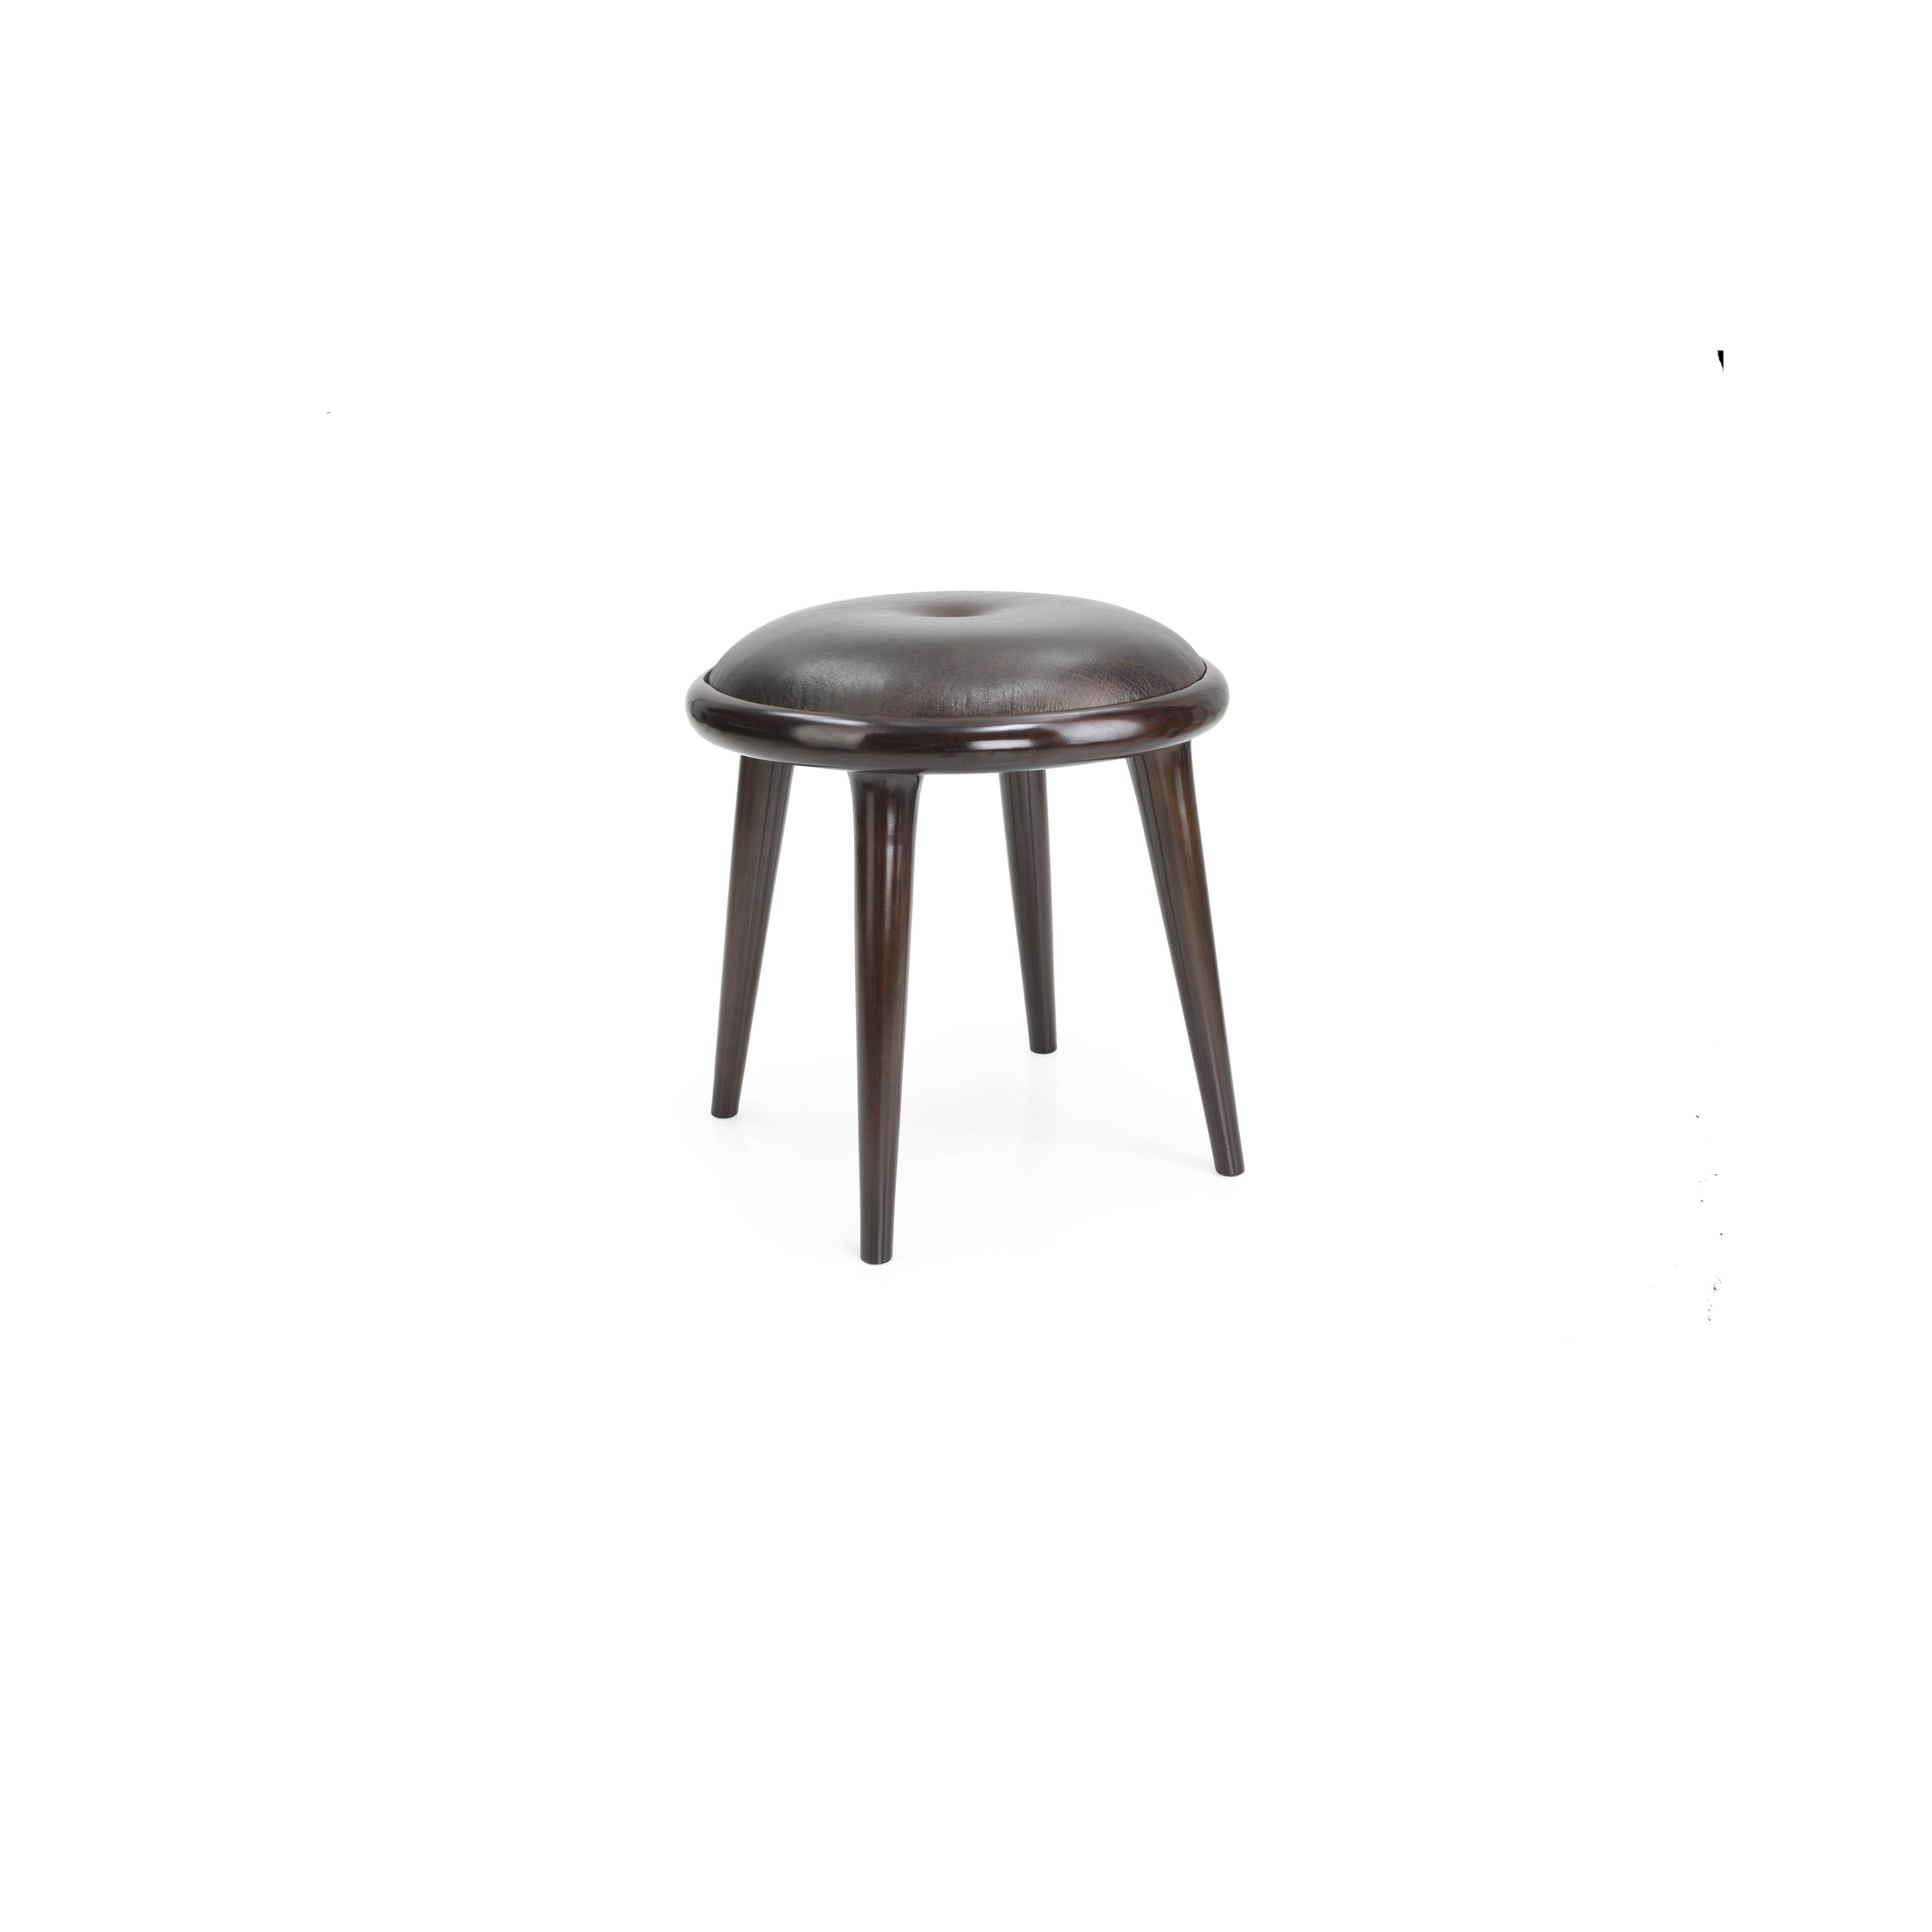 Button stool